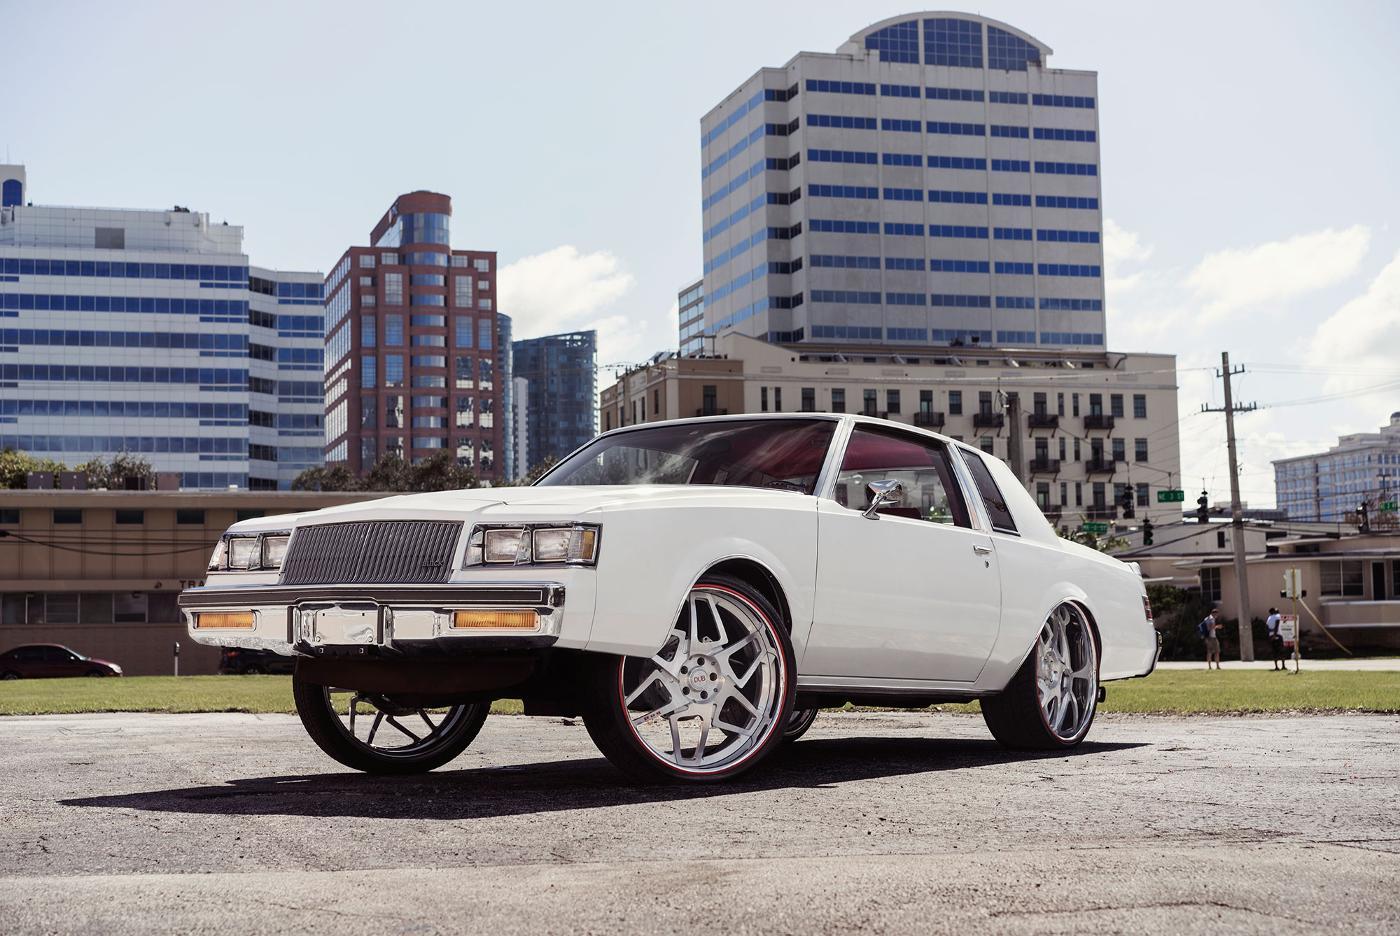 Nissan Dealer Miami >> Dub | Game On X80 - DUB Wheels